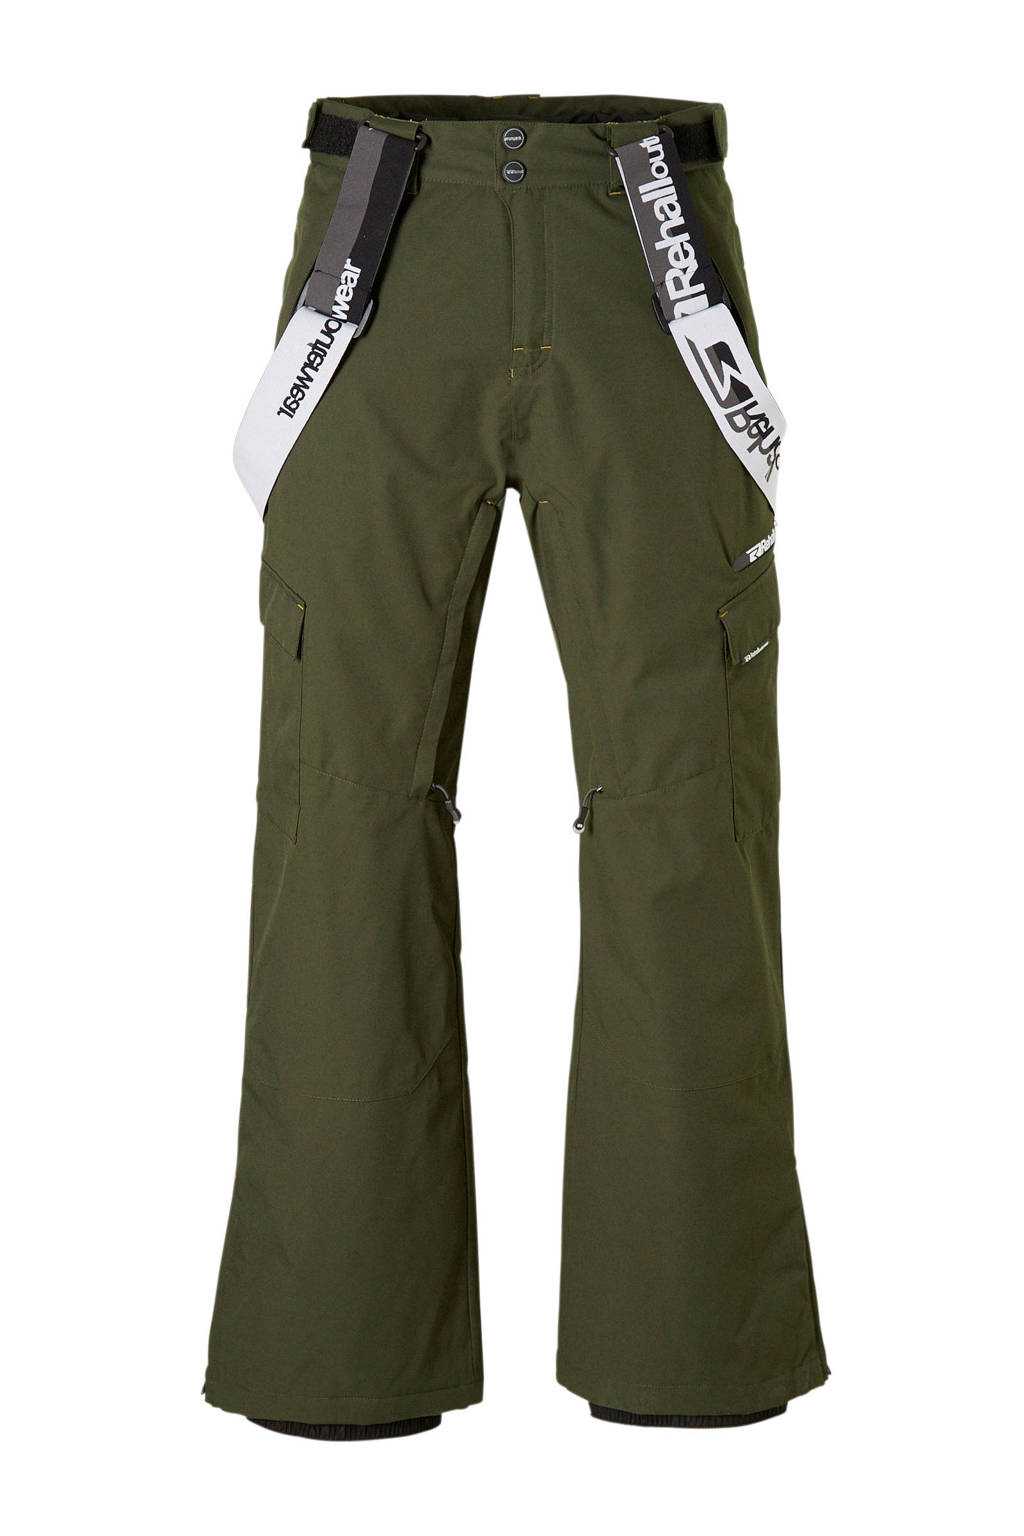 Rehall skibroek Charlie-R, Donkergroen/zwart